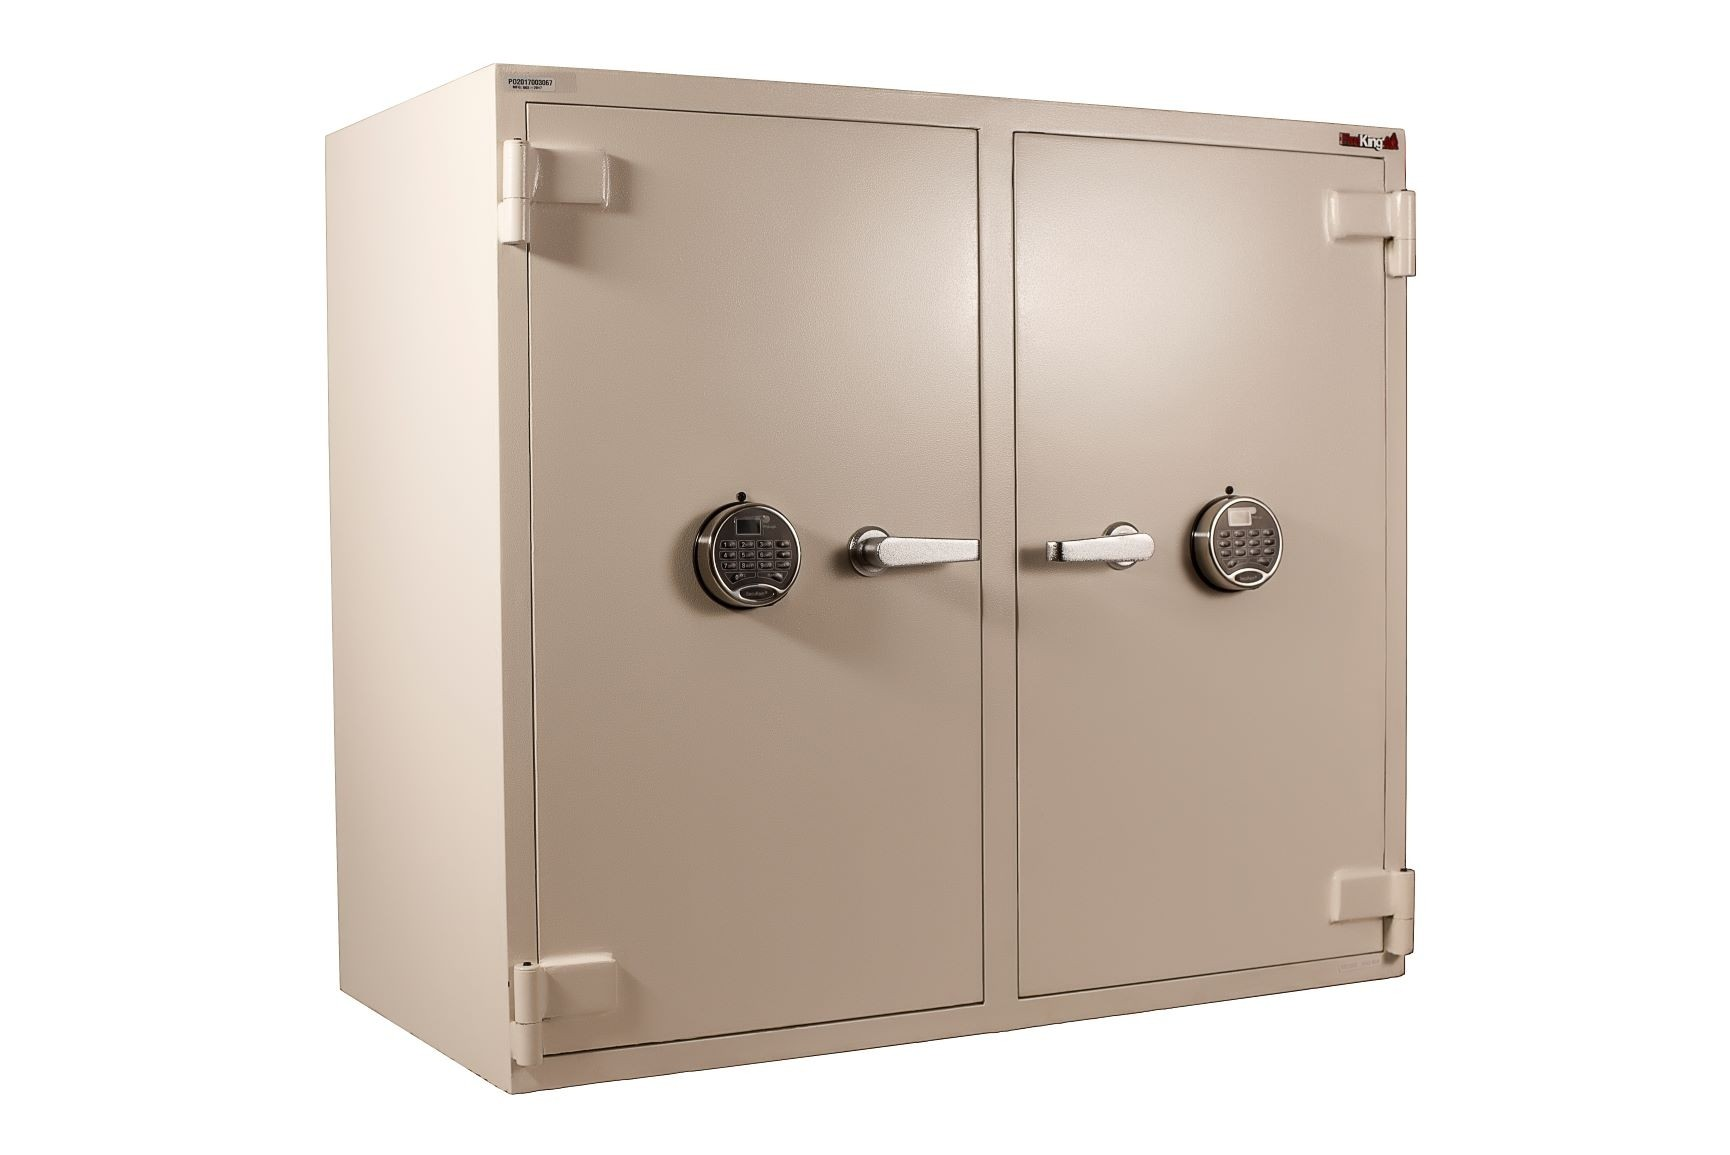 B-Rated Double Door Pharmacy Safe, FireKing B3742WD-SR2